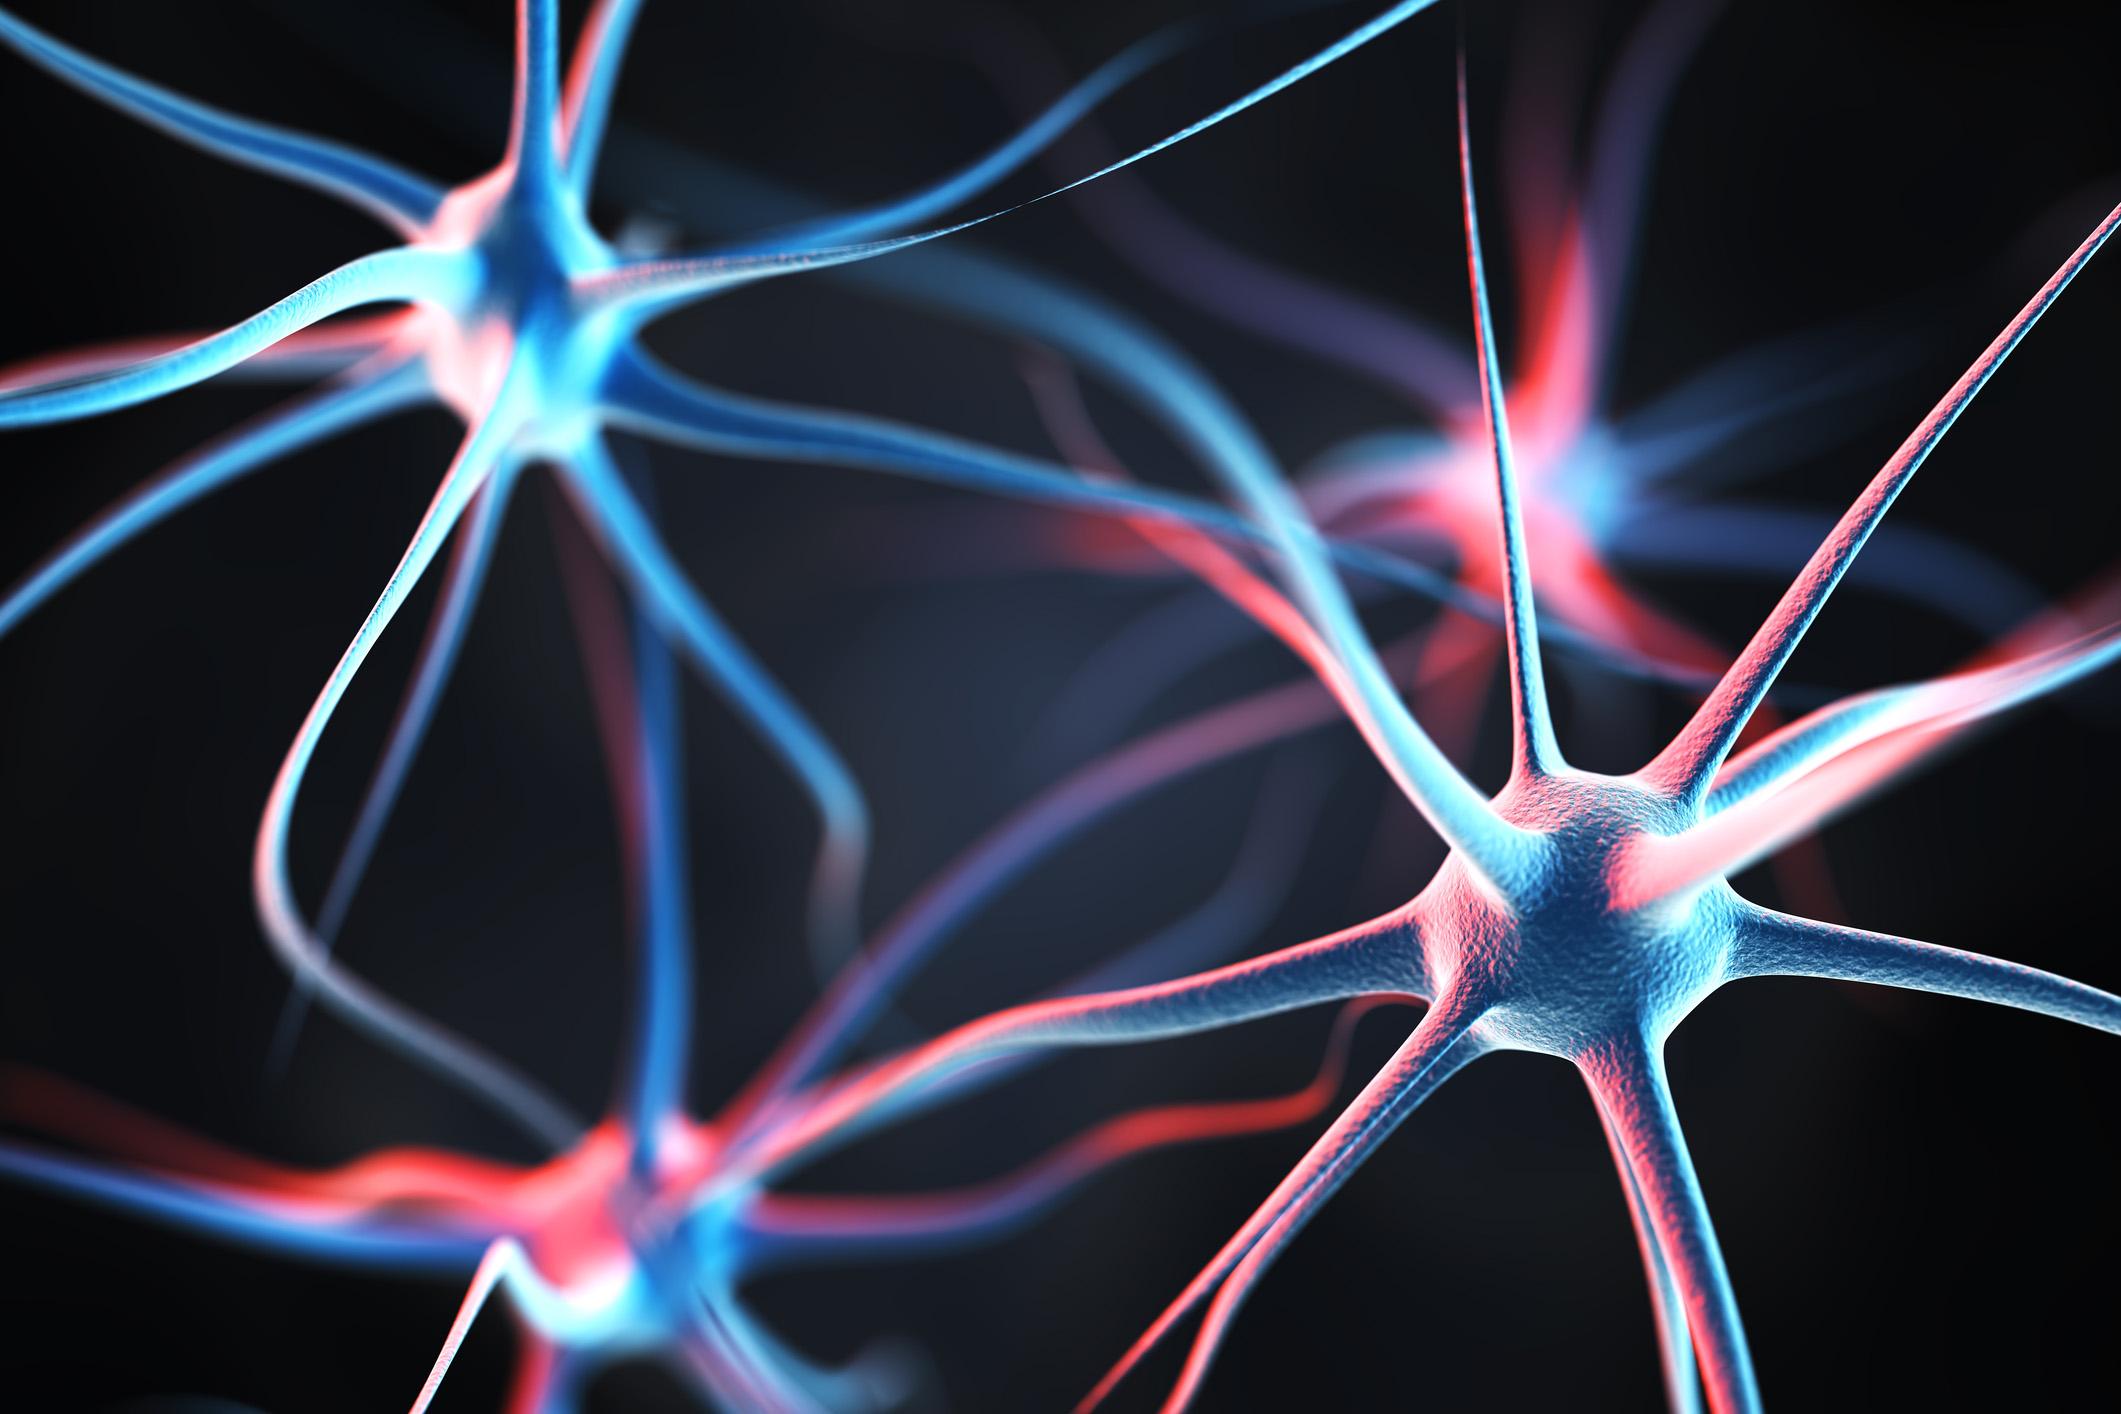 Schizophrenic Brain -Schizophrenia Neurological Impact